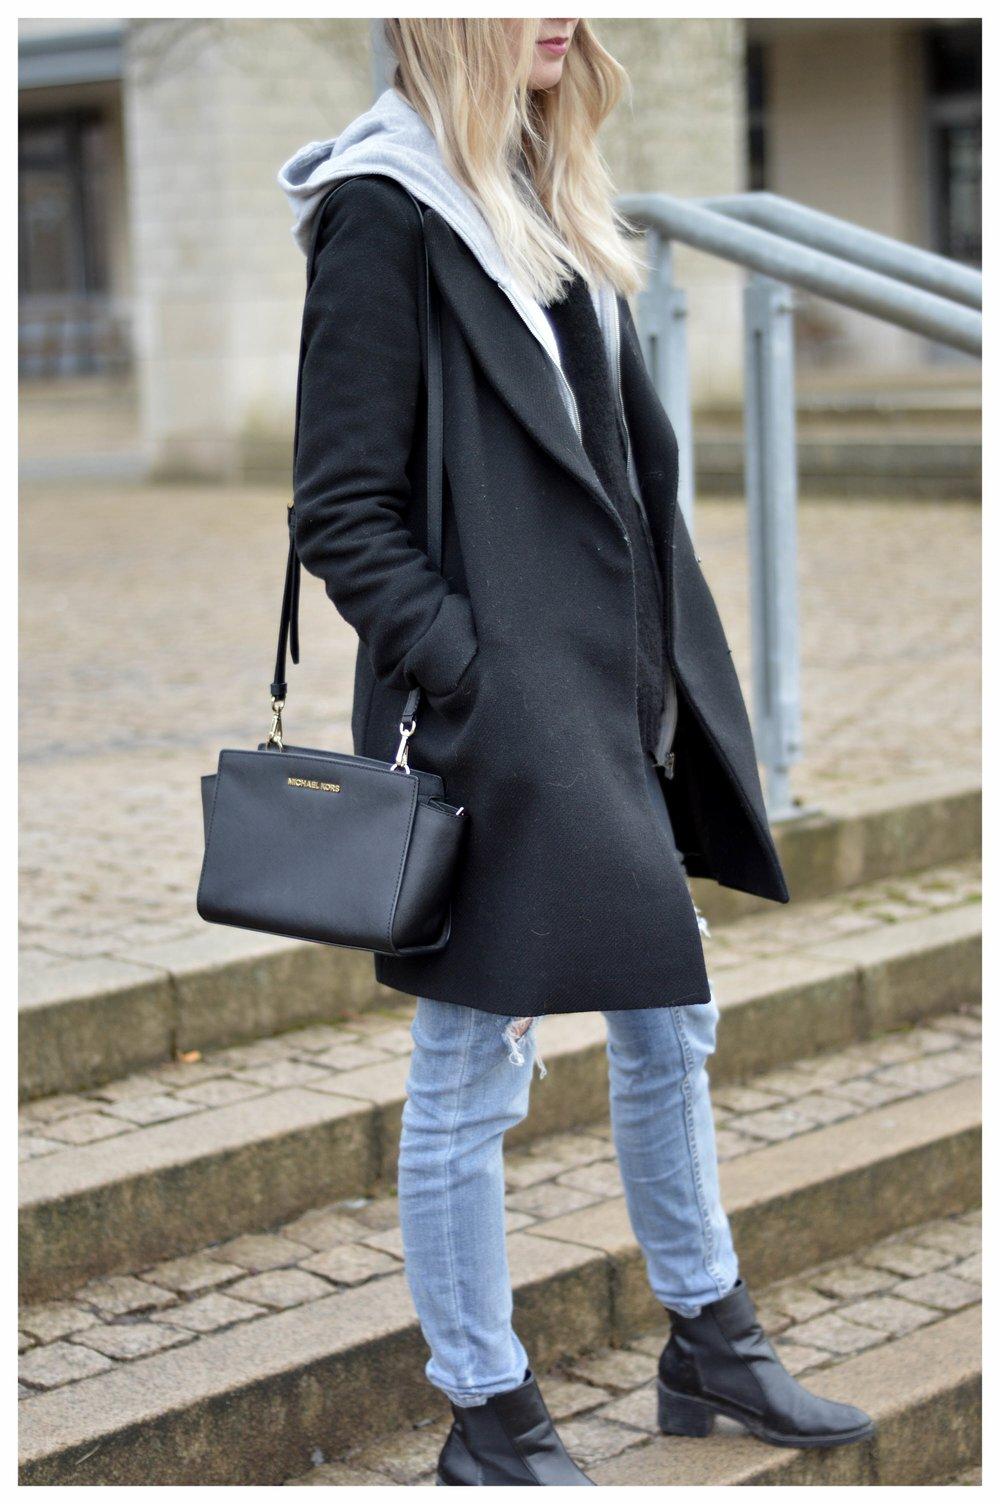 Black Coat Hoodie & Ripped Jeans - OSIARAH.COM (47 sur 54).jpg